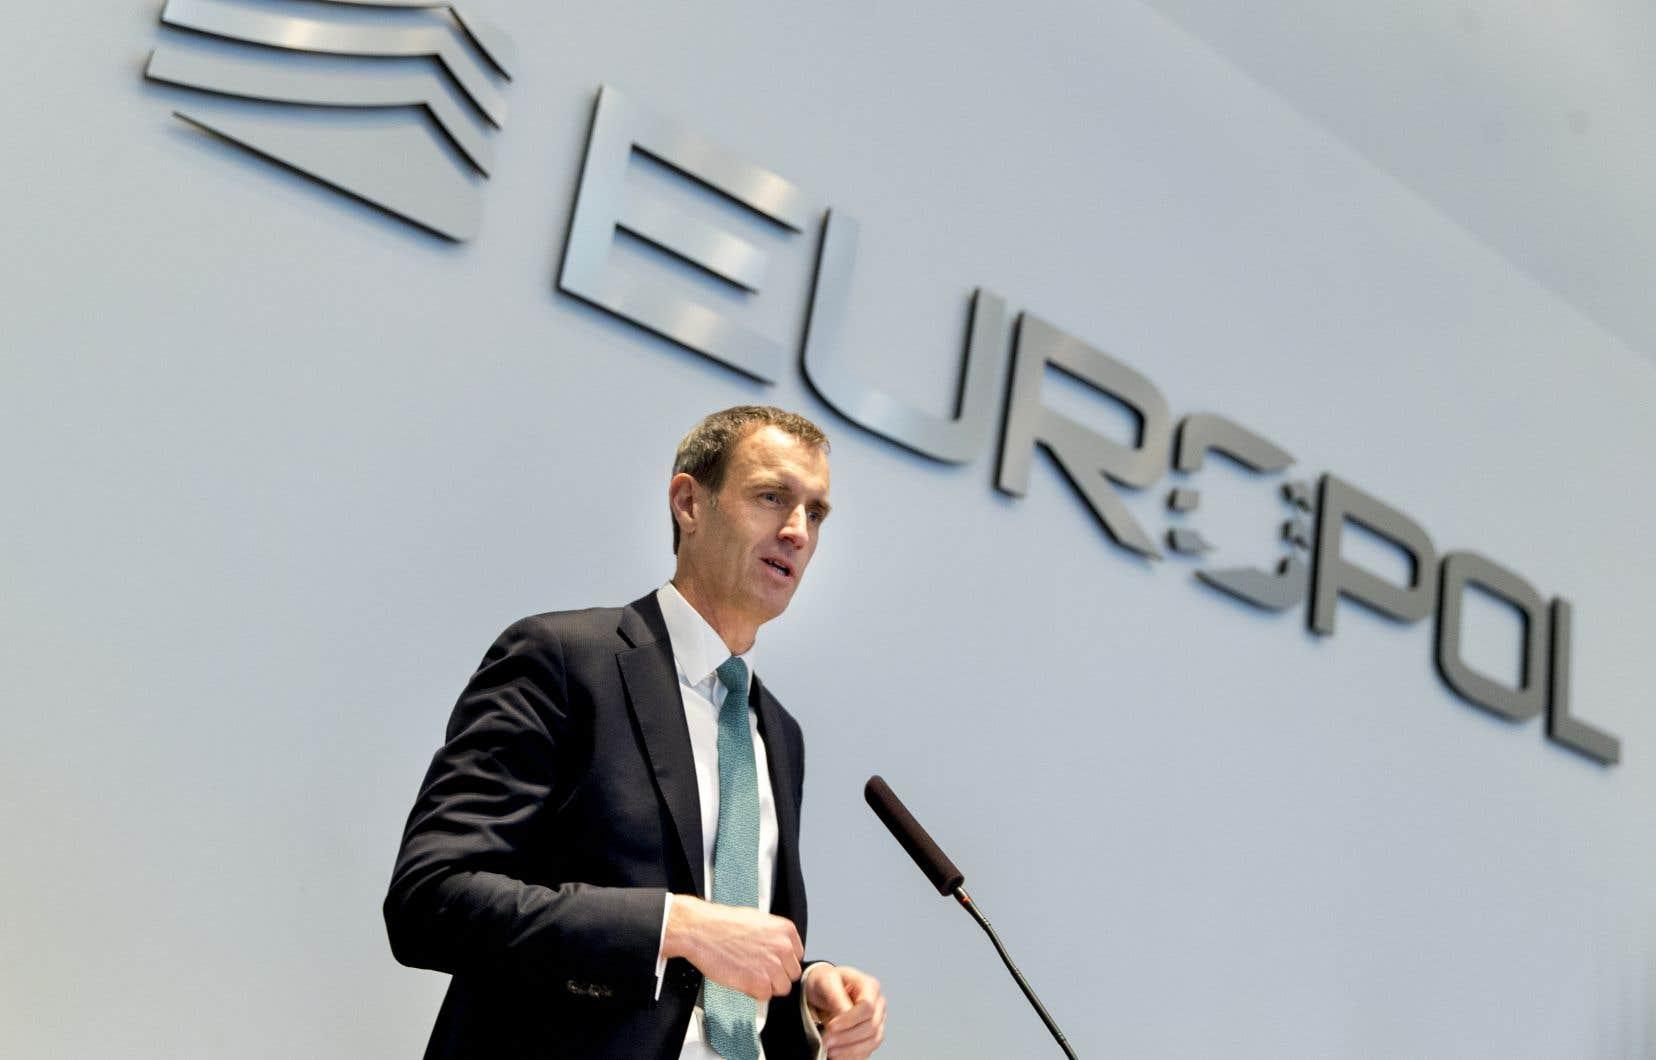 Le chef de l'agence européenne de police Europol, Rob Wainwright